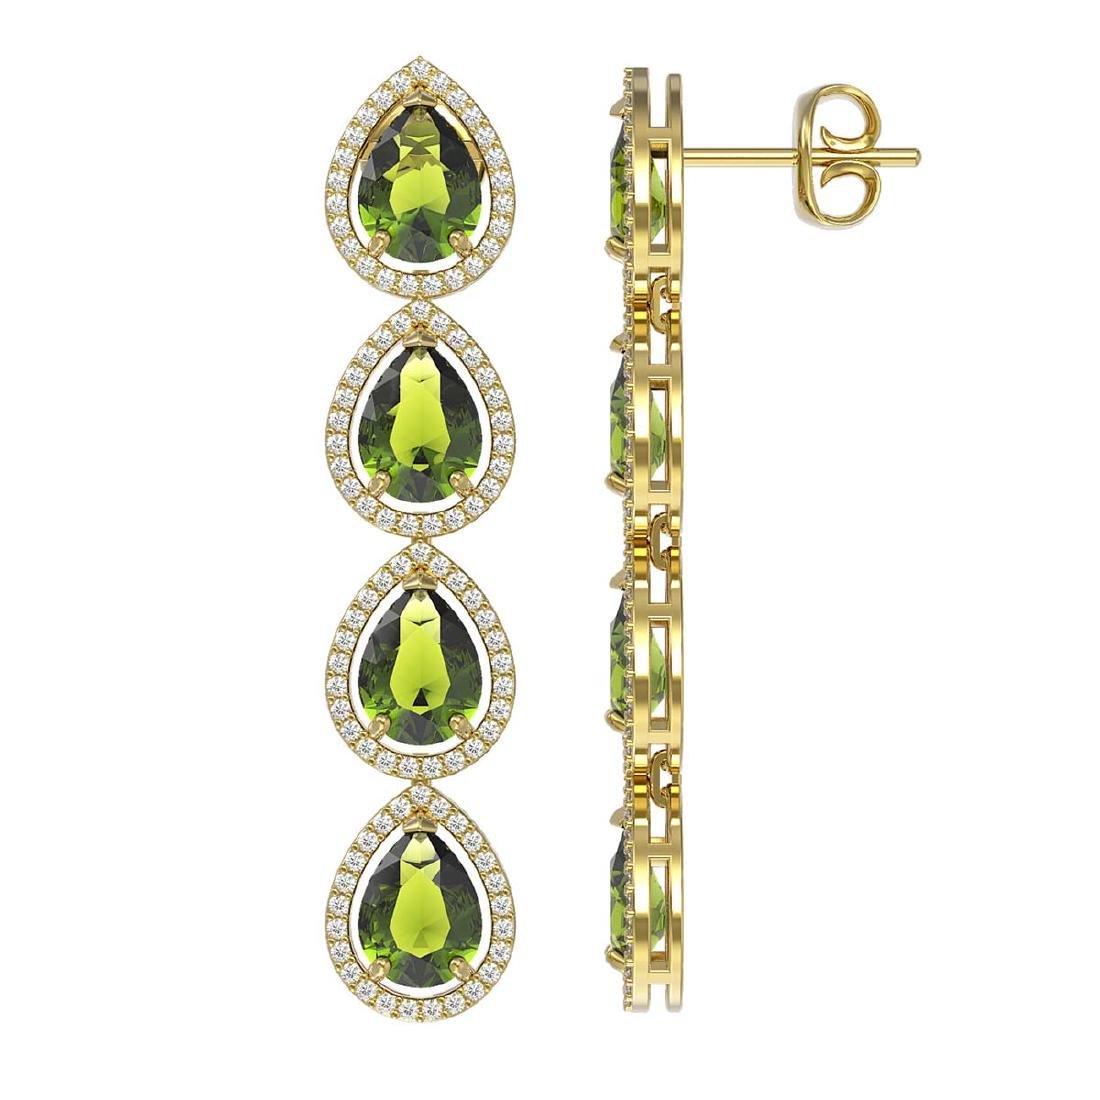 10.48 CTW Tourmaline & Diamond Halo Earrings 10K Yellow - 2